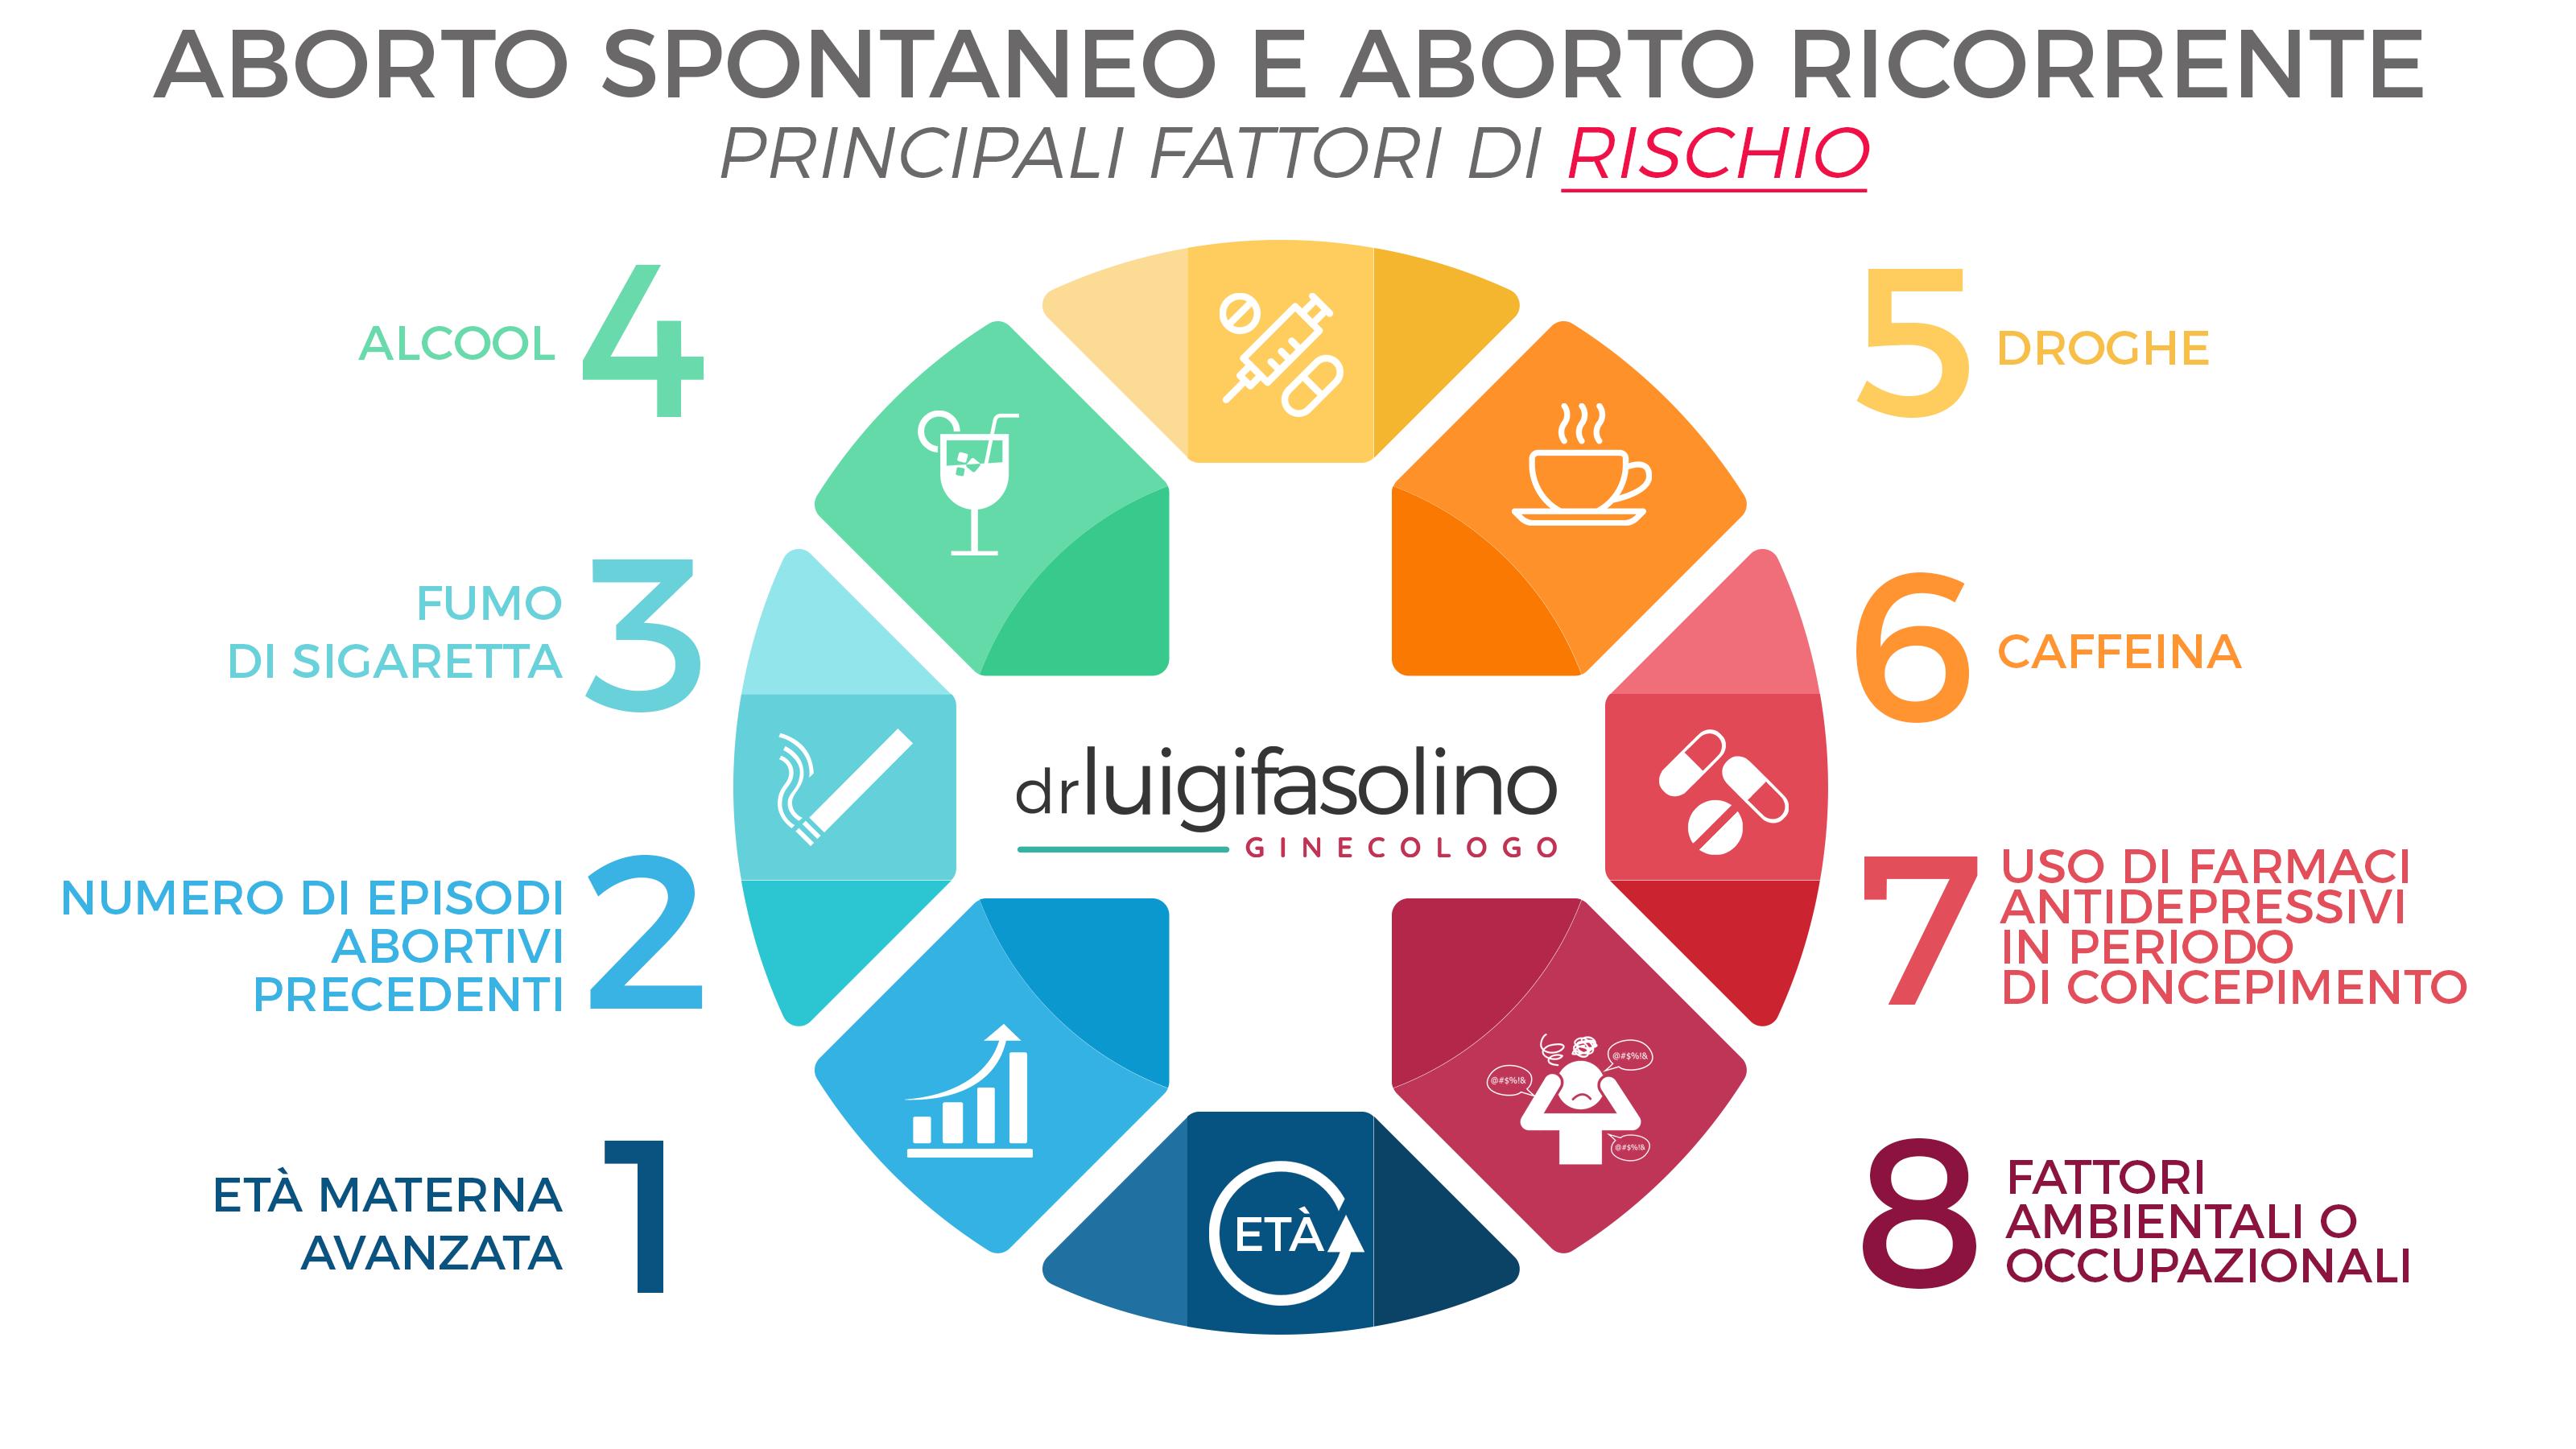 luigi-fasolino-aborto-spontaneo-ricorrente-cause-fattori-rischio